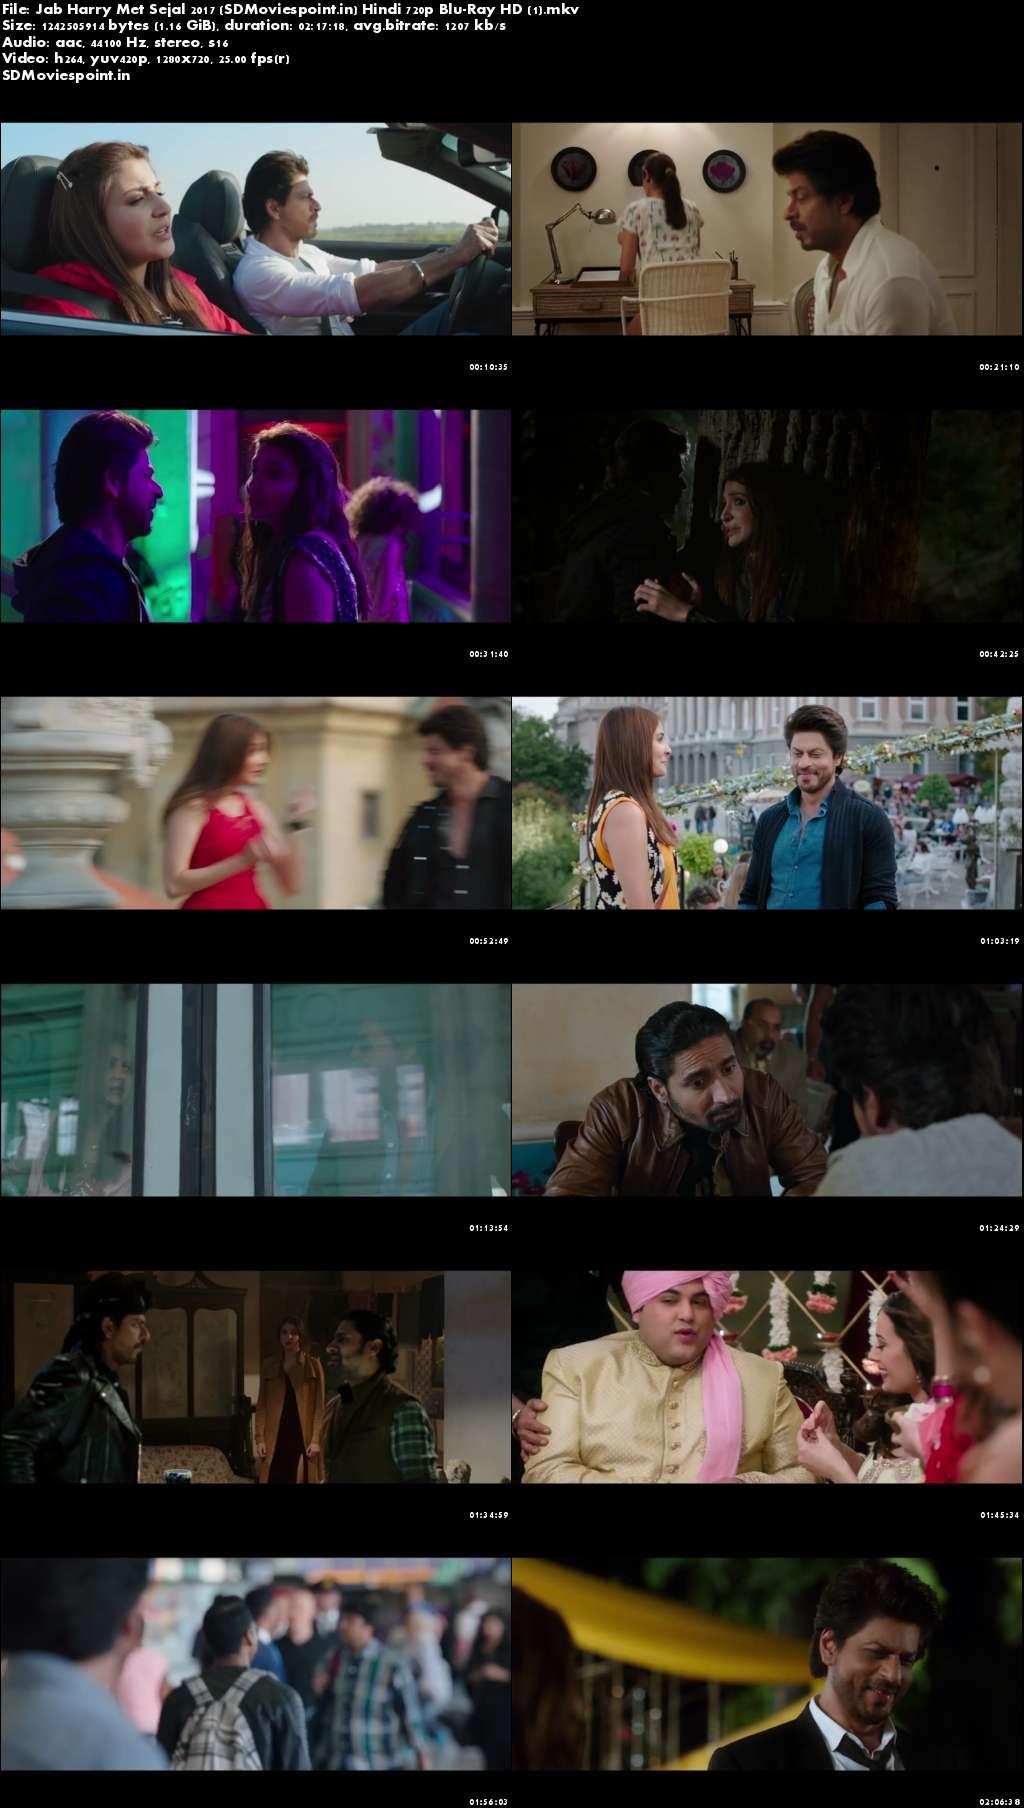 Screen Shots Jab Harry met Sejal (2017) Full HD Movie Download Free 720p